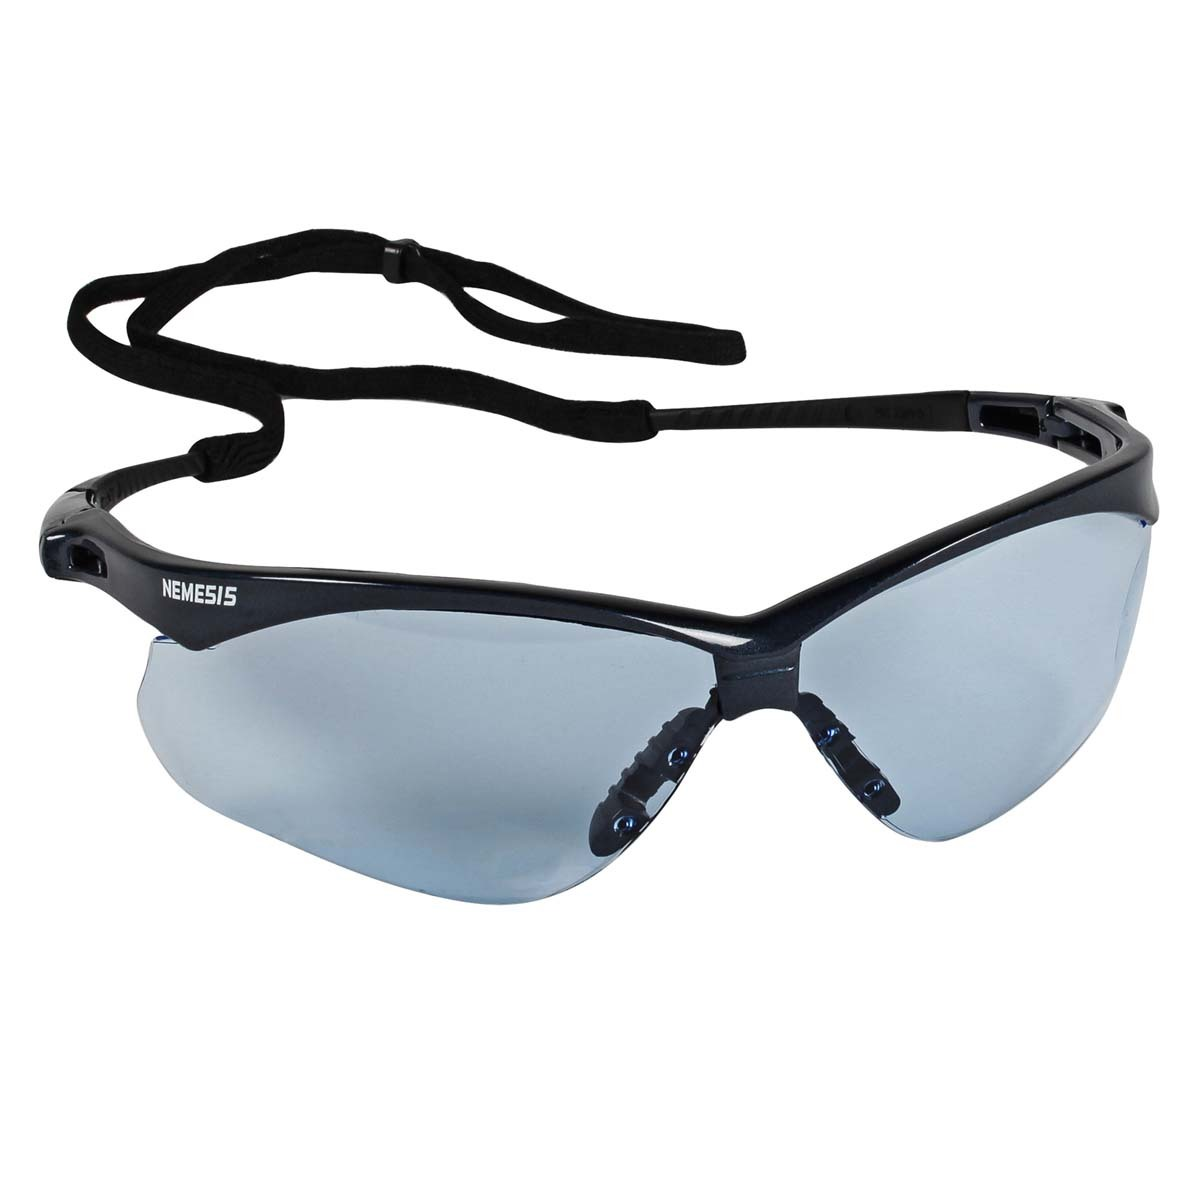 335865507fd6 Kimberly-Clark Professional* Jackson Safety* Nemesis* Blue Safety Glasses  With Light Blue